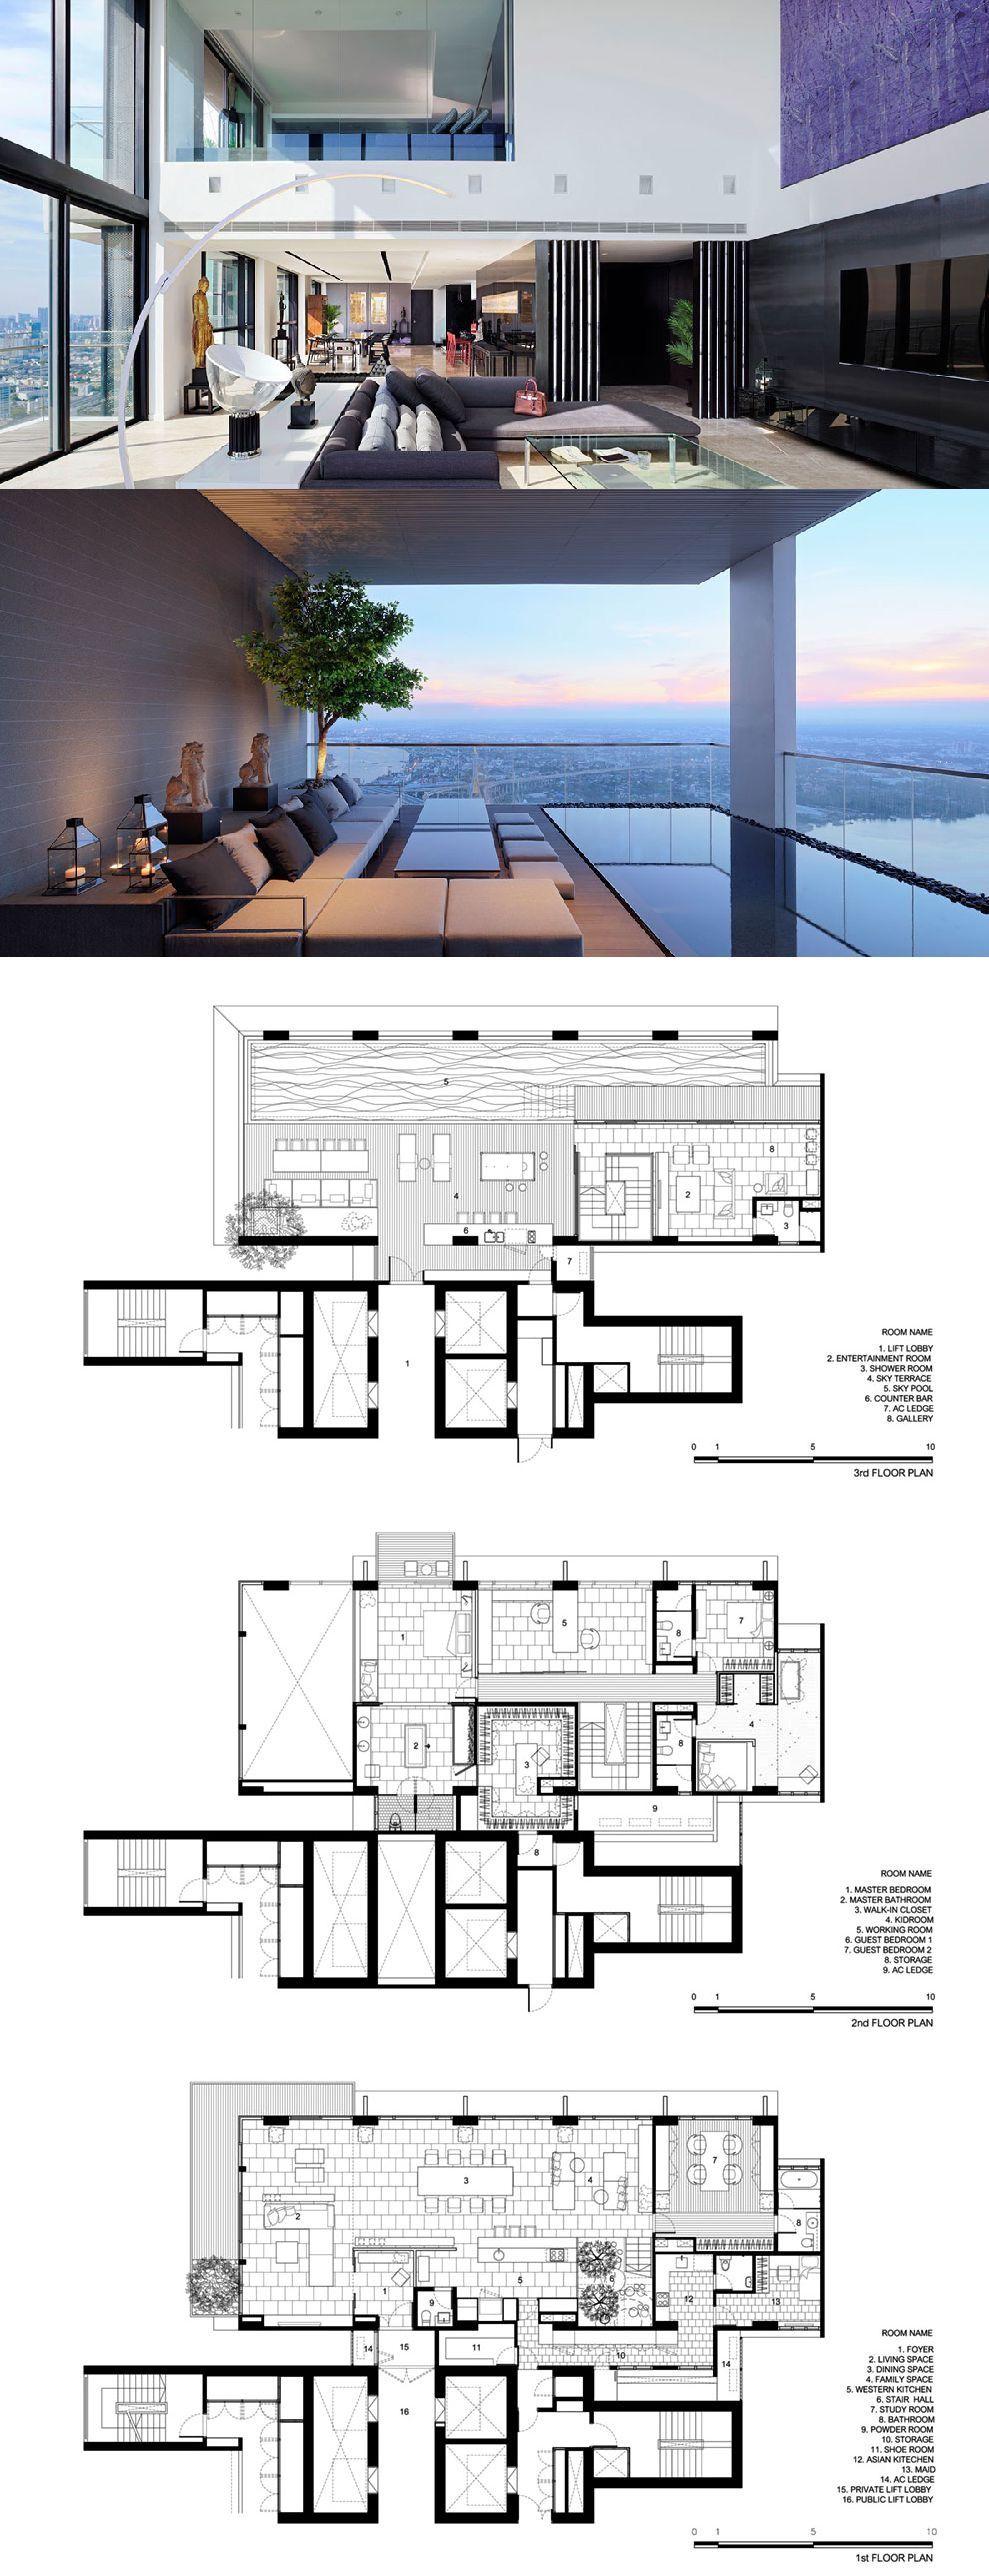 Pano Penthouse Penthouse Apartment Floor Plan Architectural Floor Plans Apartment Floor Plans